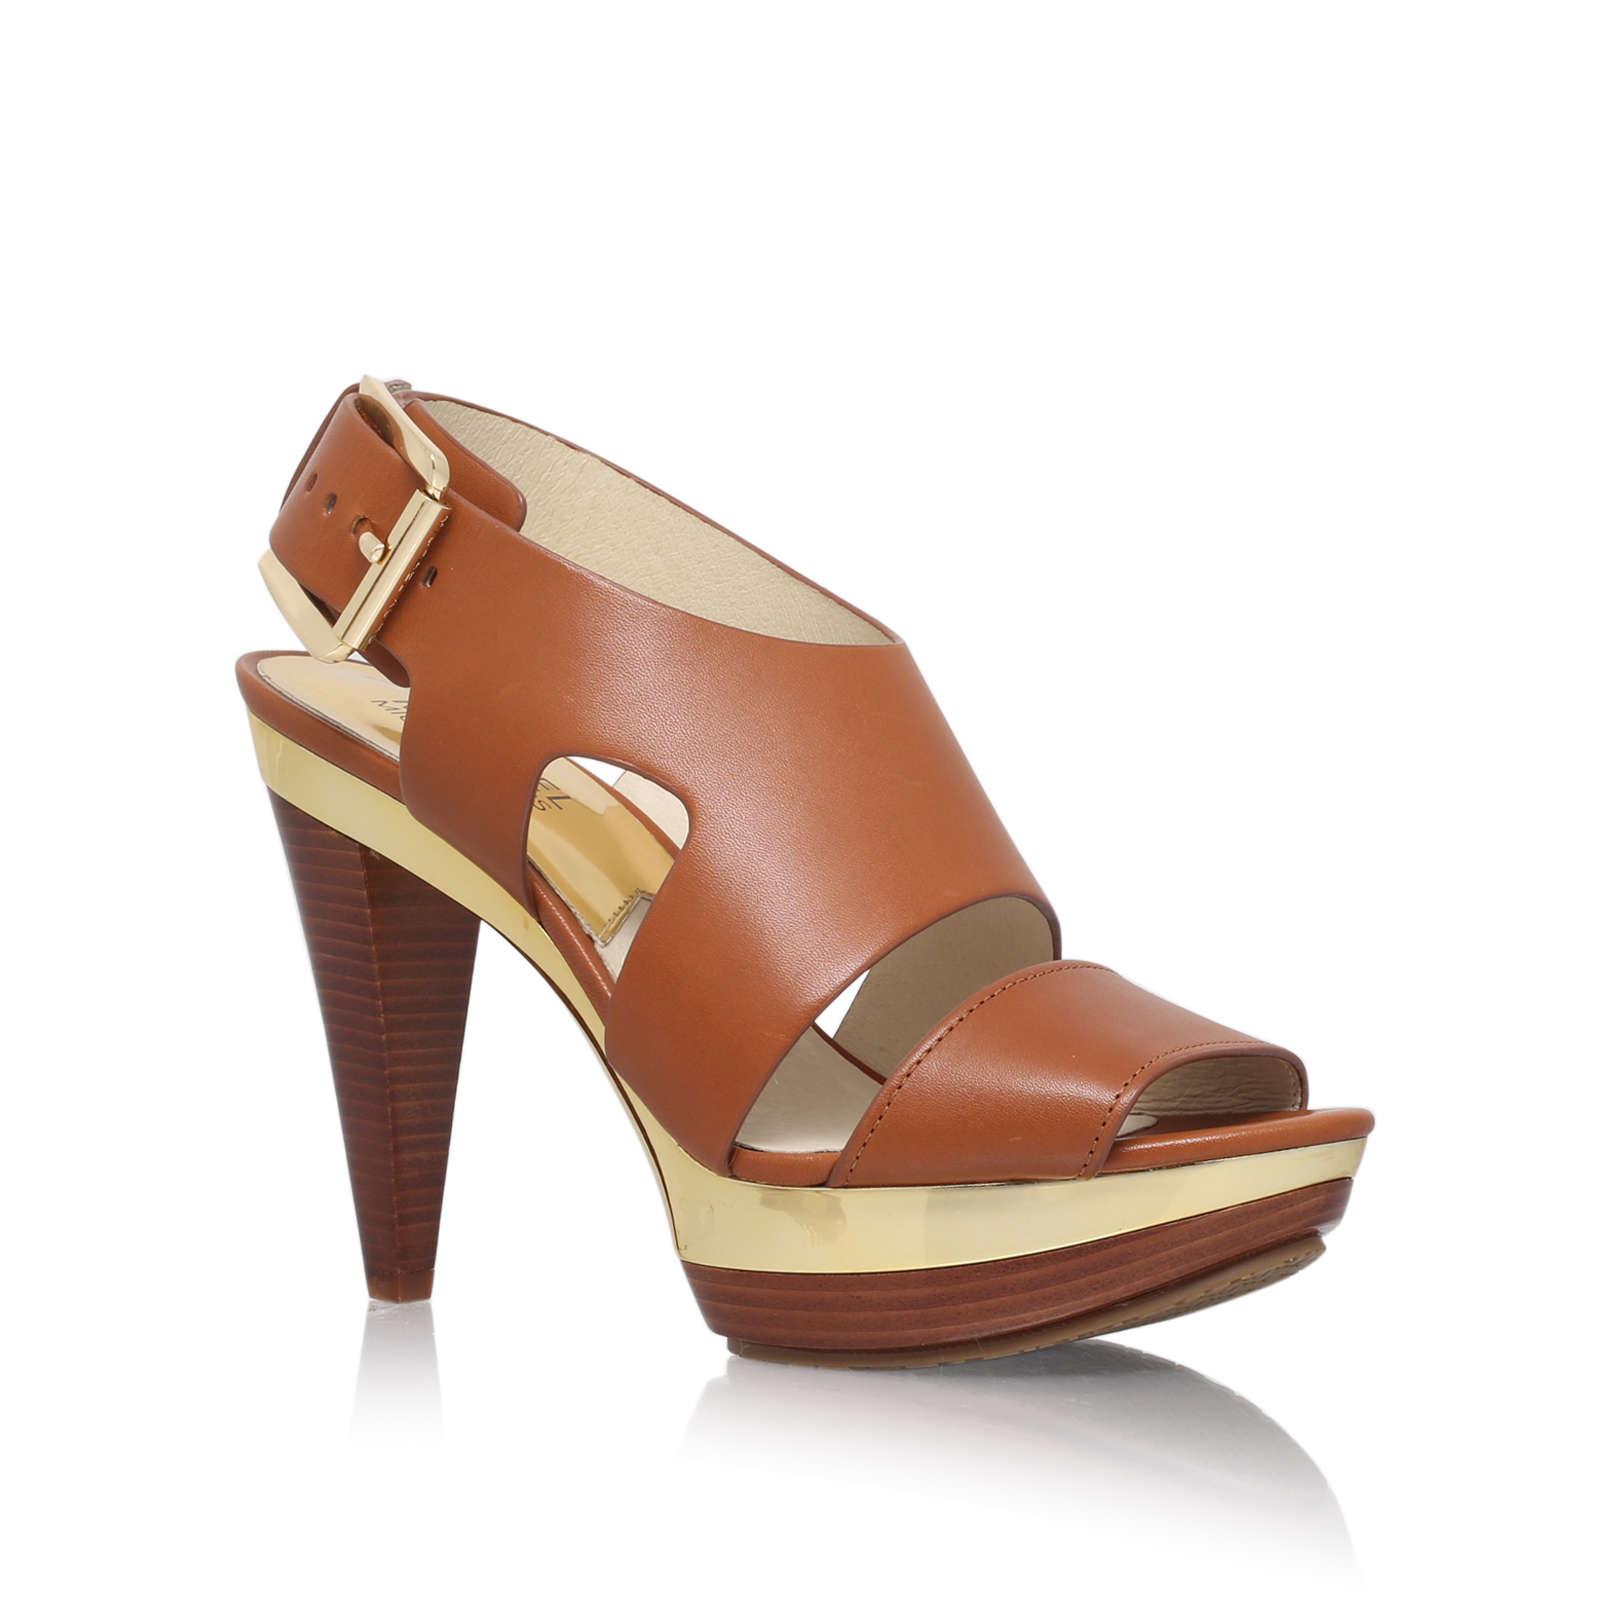 ce8609c0ea713 CARLA PLATFORM Michael Michael Kors Carla Platform Brown Leather Mid Heel  Sandals by MICHAEL MICHAEL KORS